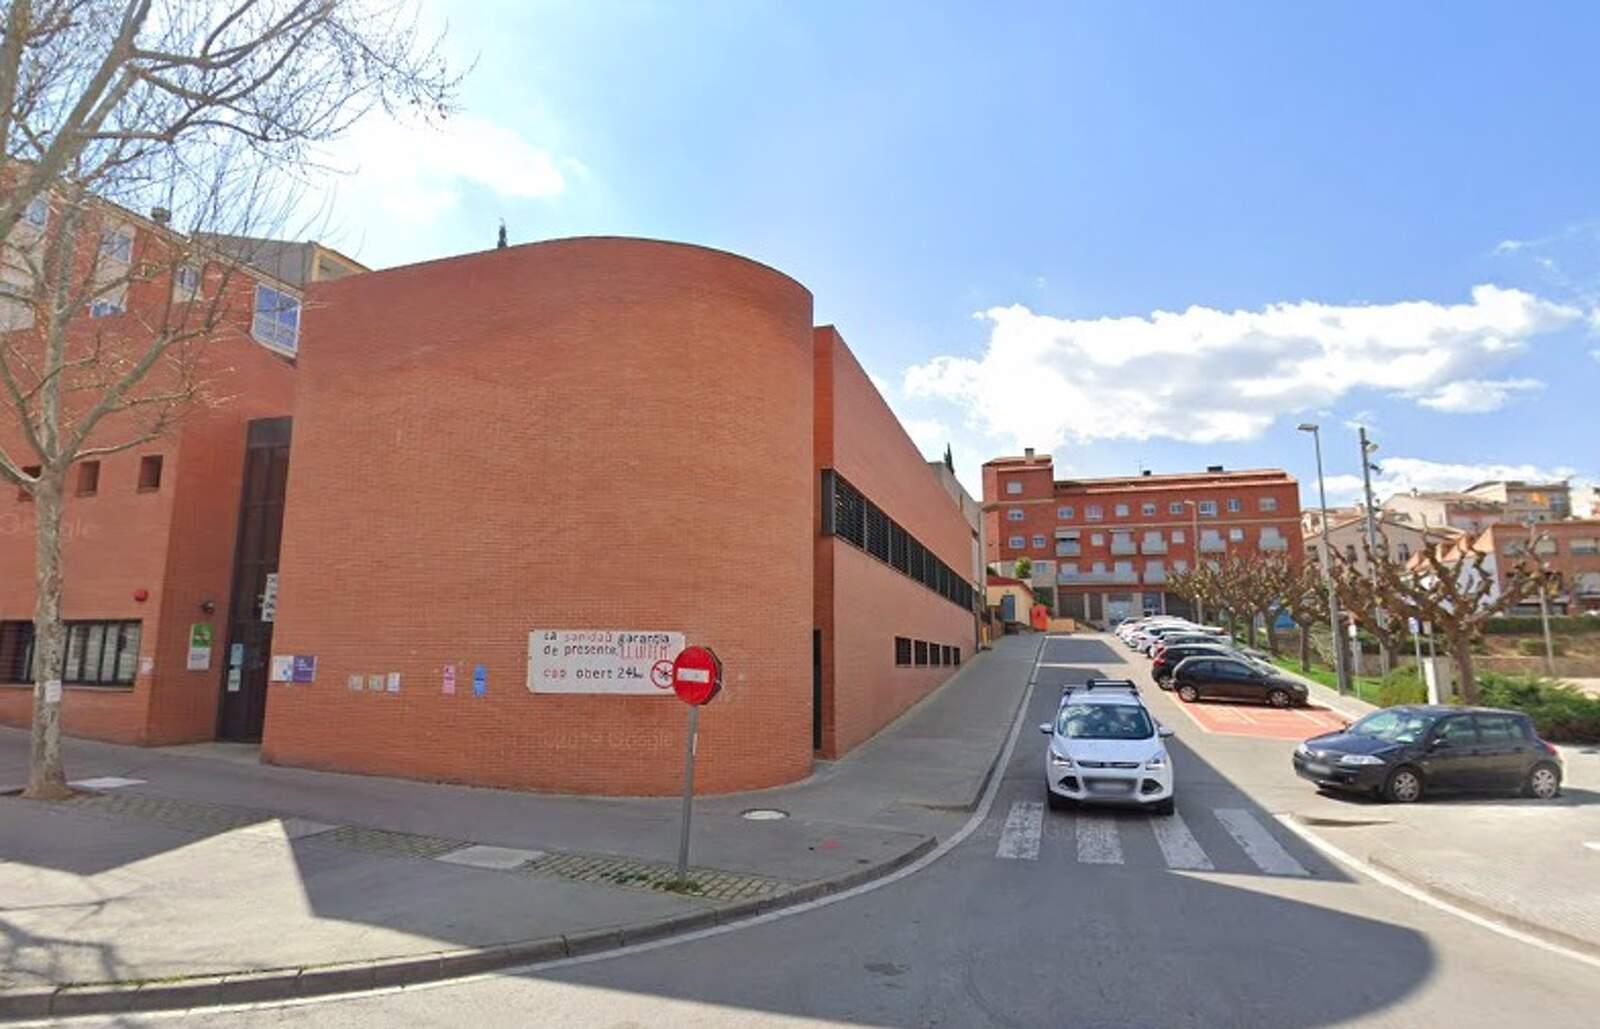 El CAP Dr Planas de Castellbisbal